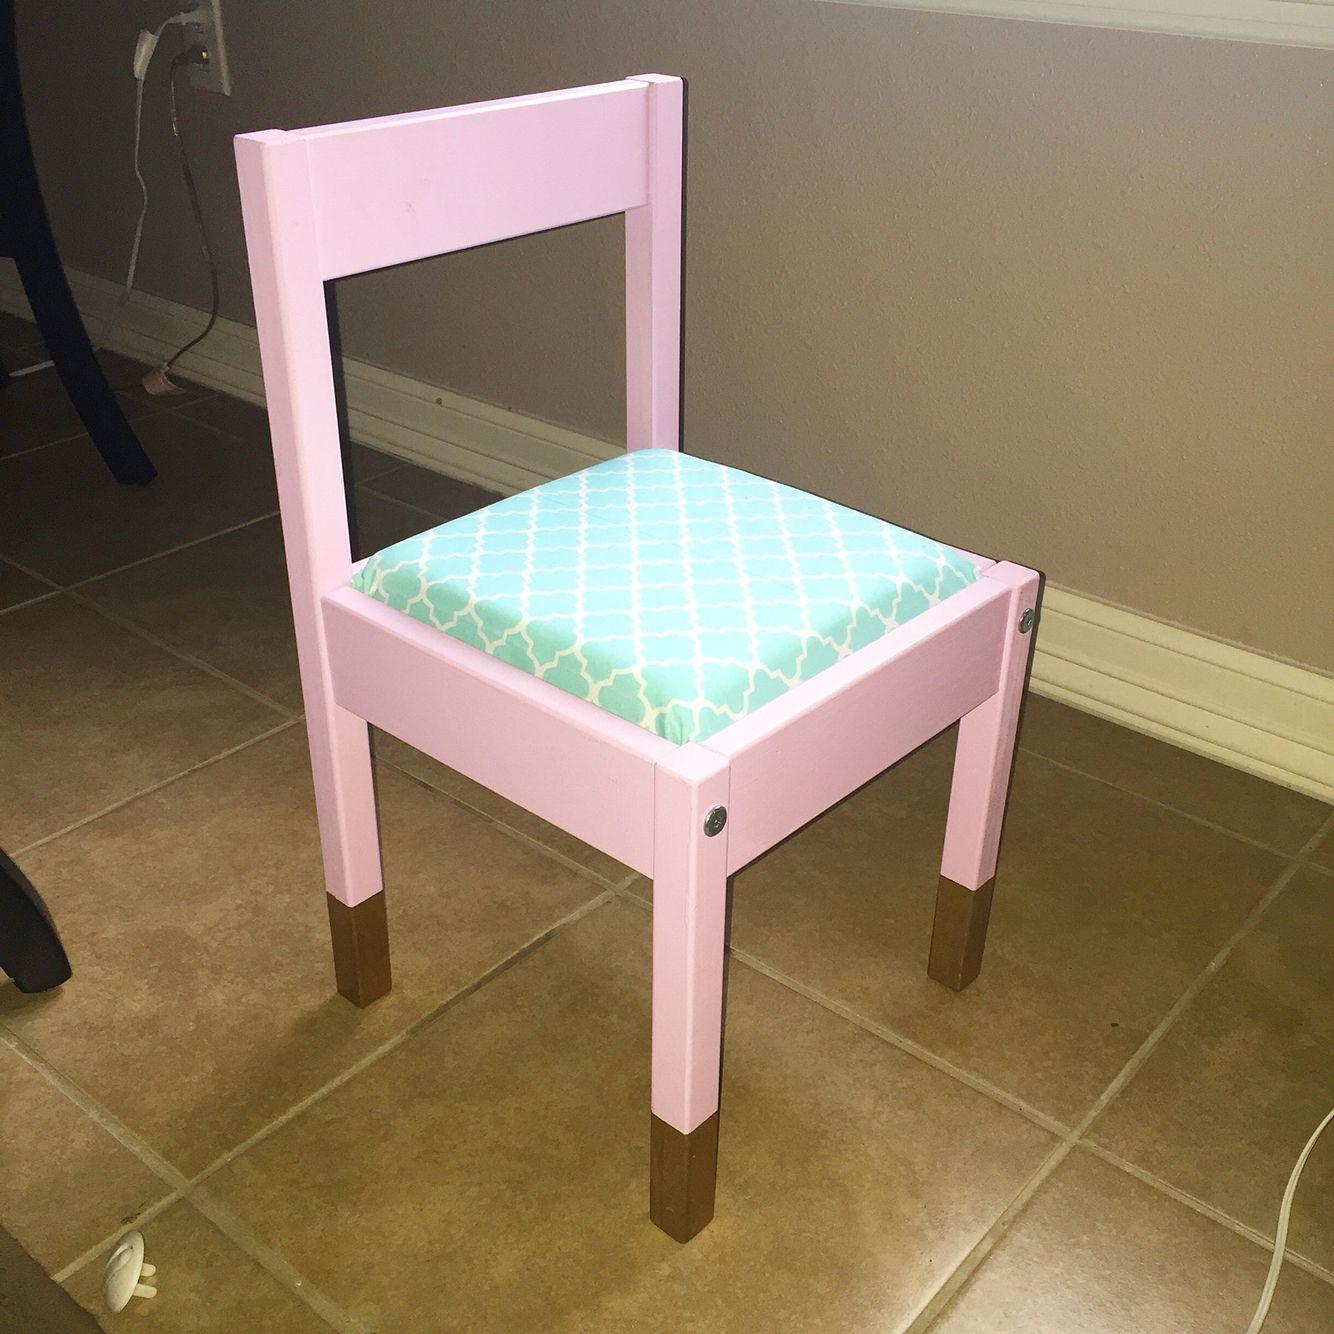 Ikea Latt Hack Adding Seat Cushions All Supplies Purchased At